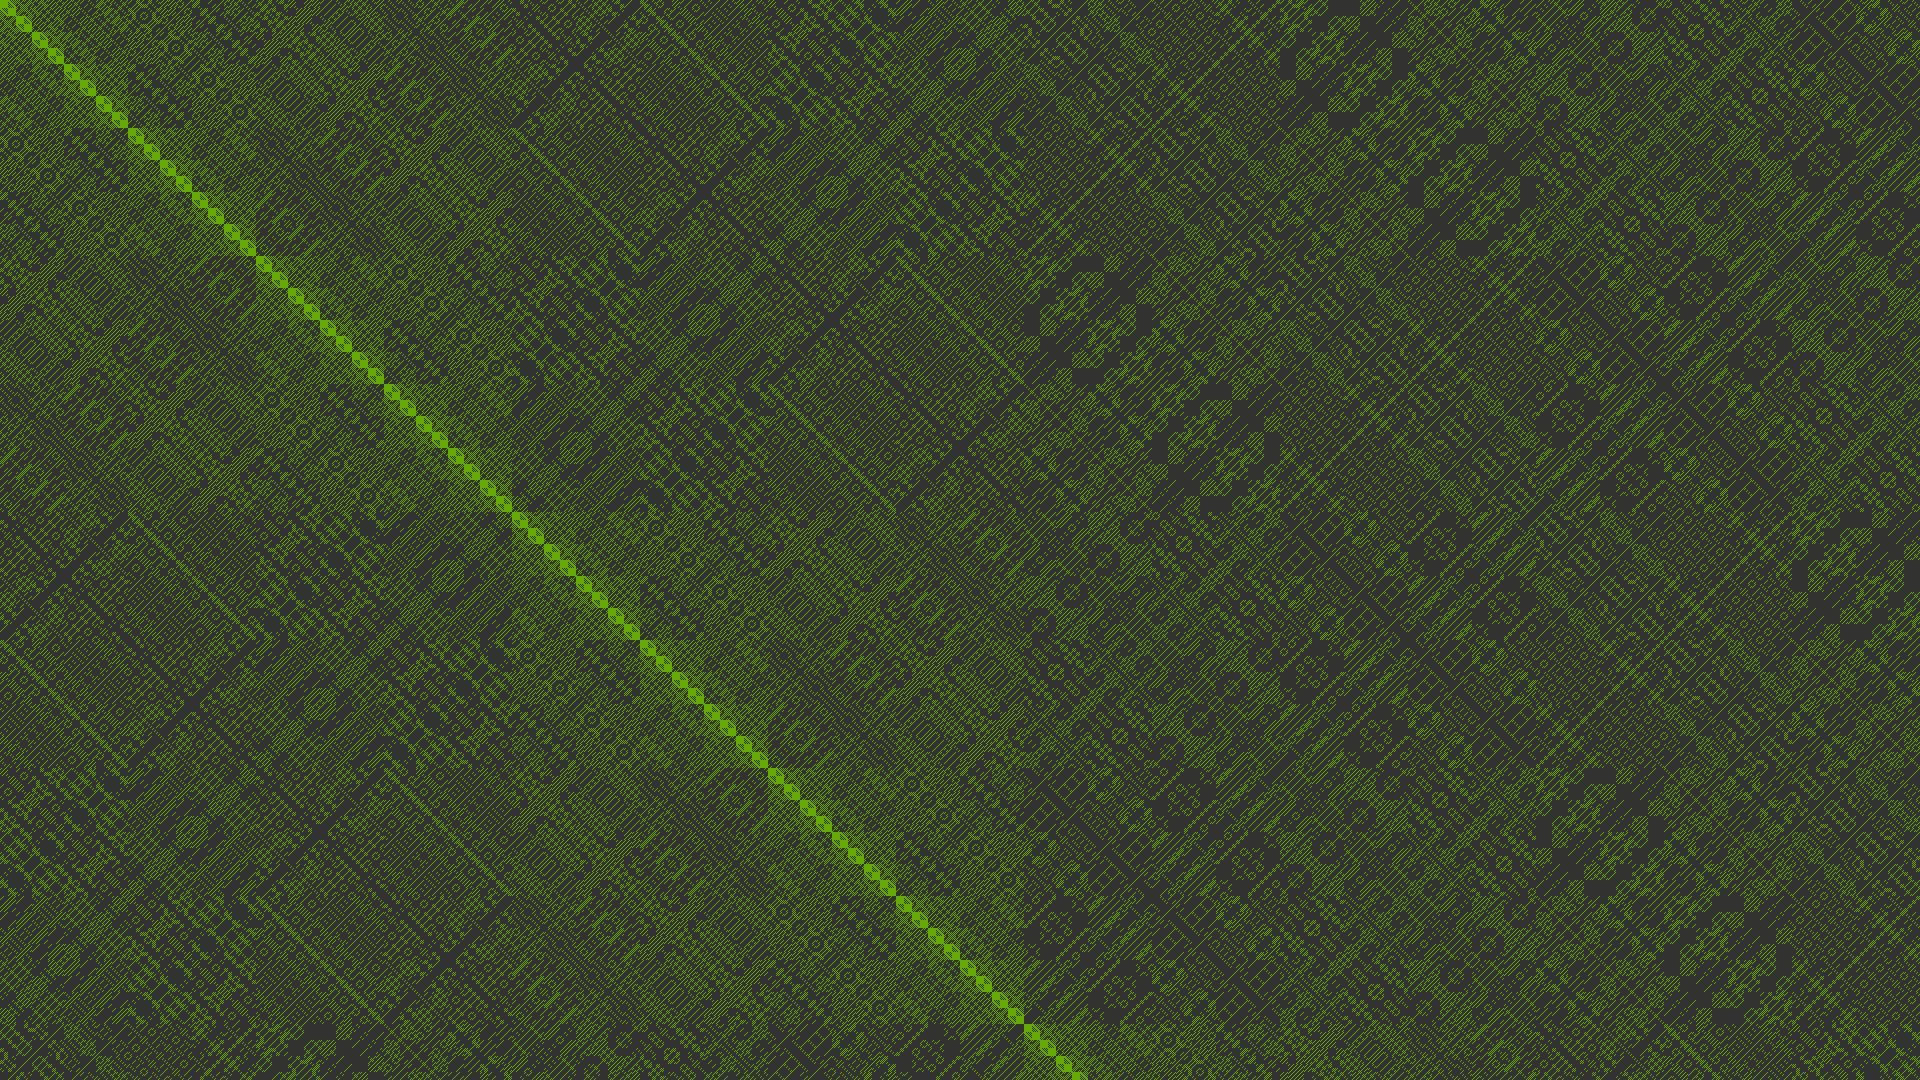 Wallpaper : procedural generation, green 1920x1080